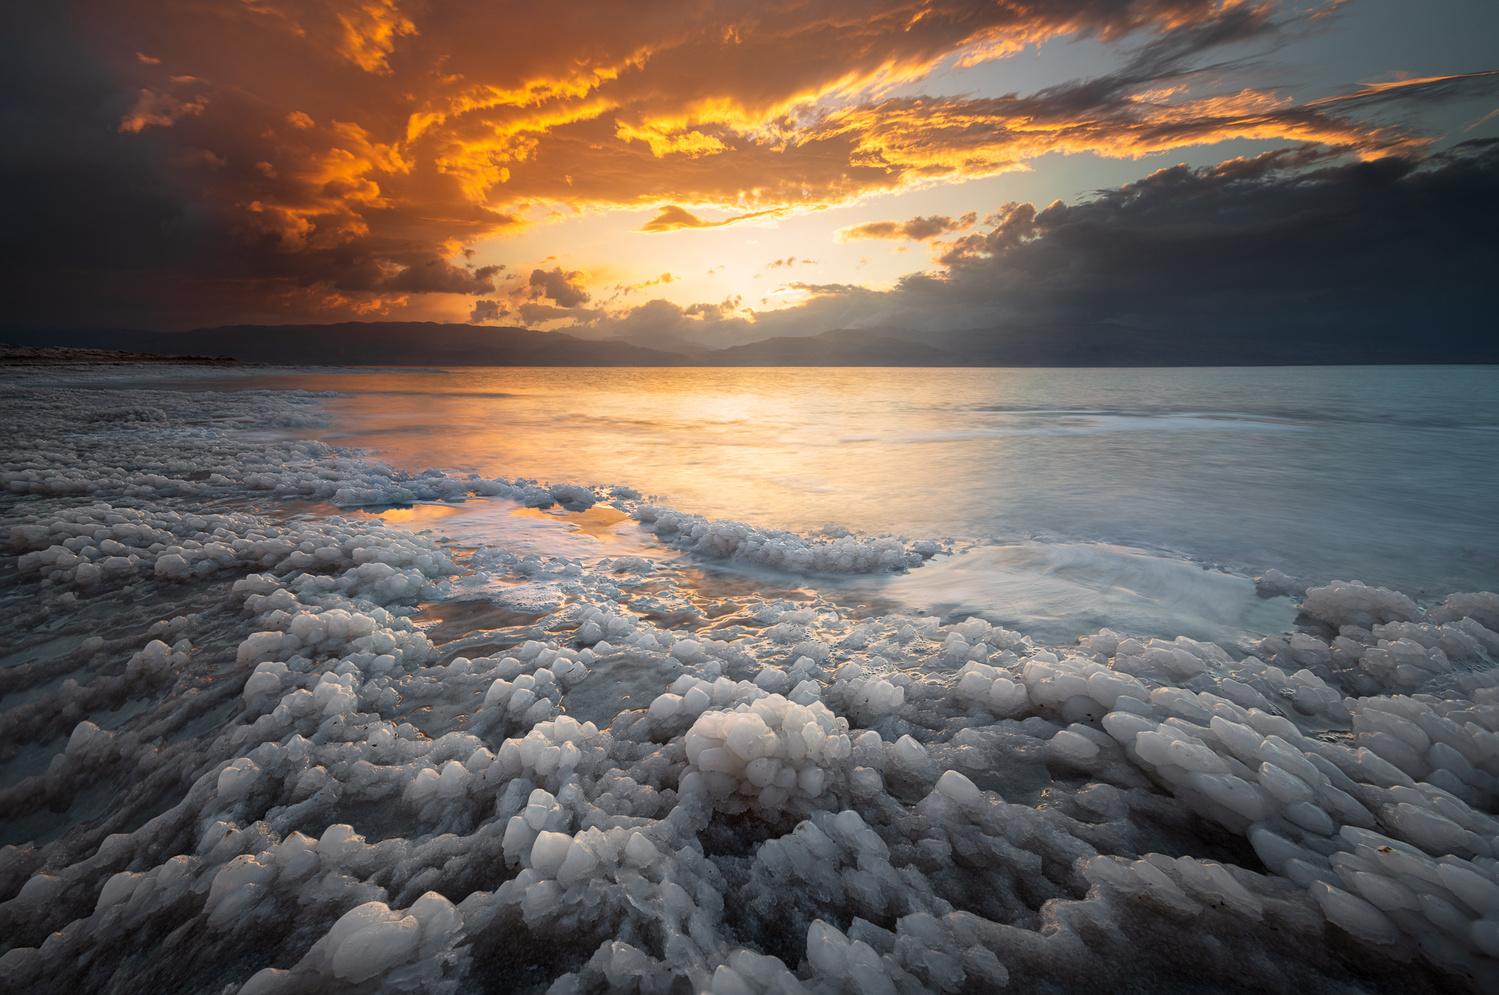 Lines in the Salt by Idan Livni